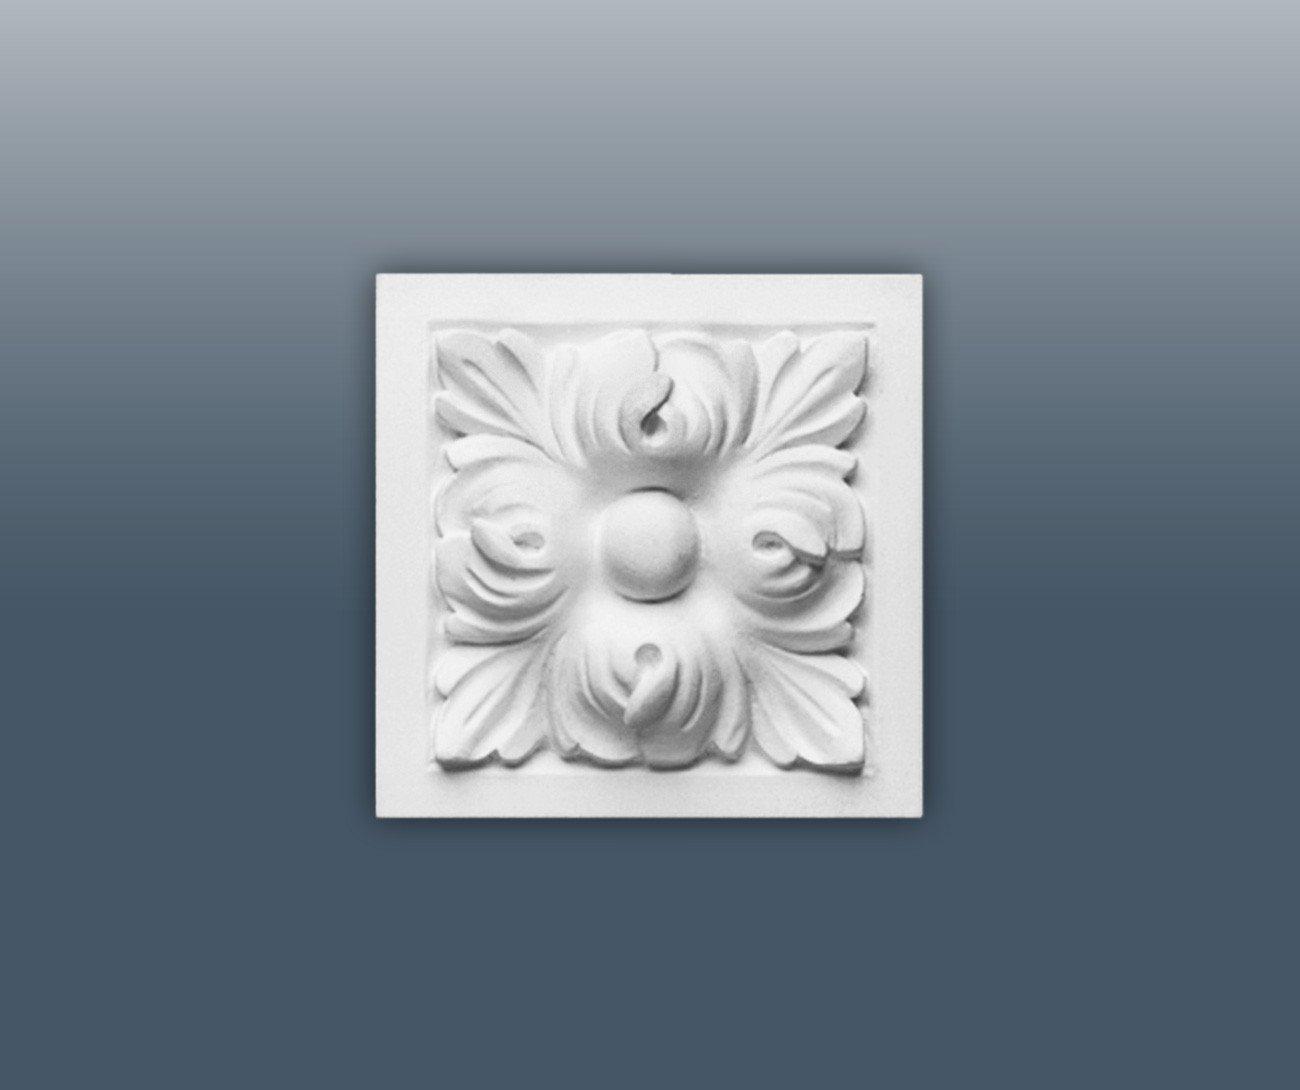 Orac Decor D210 LUXXUS door window frame pediment